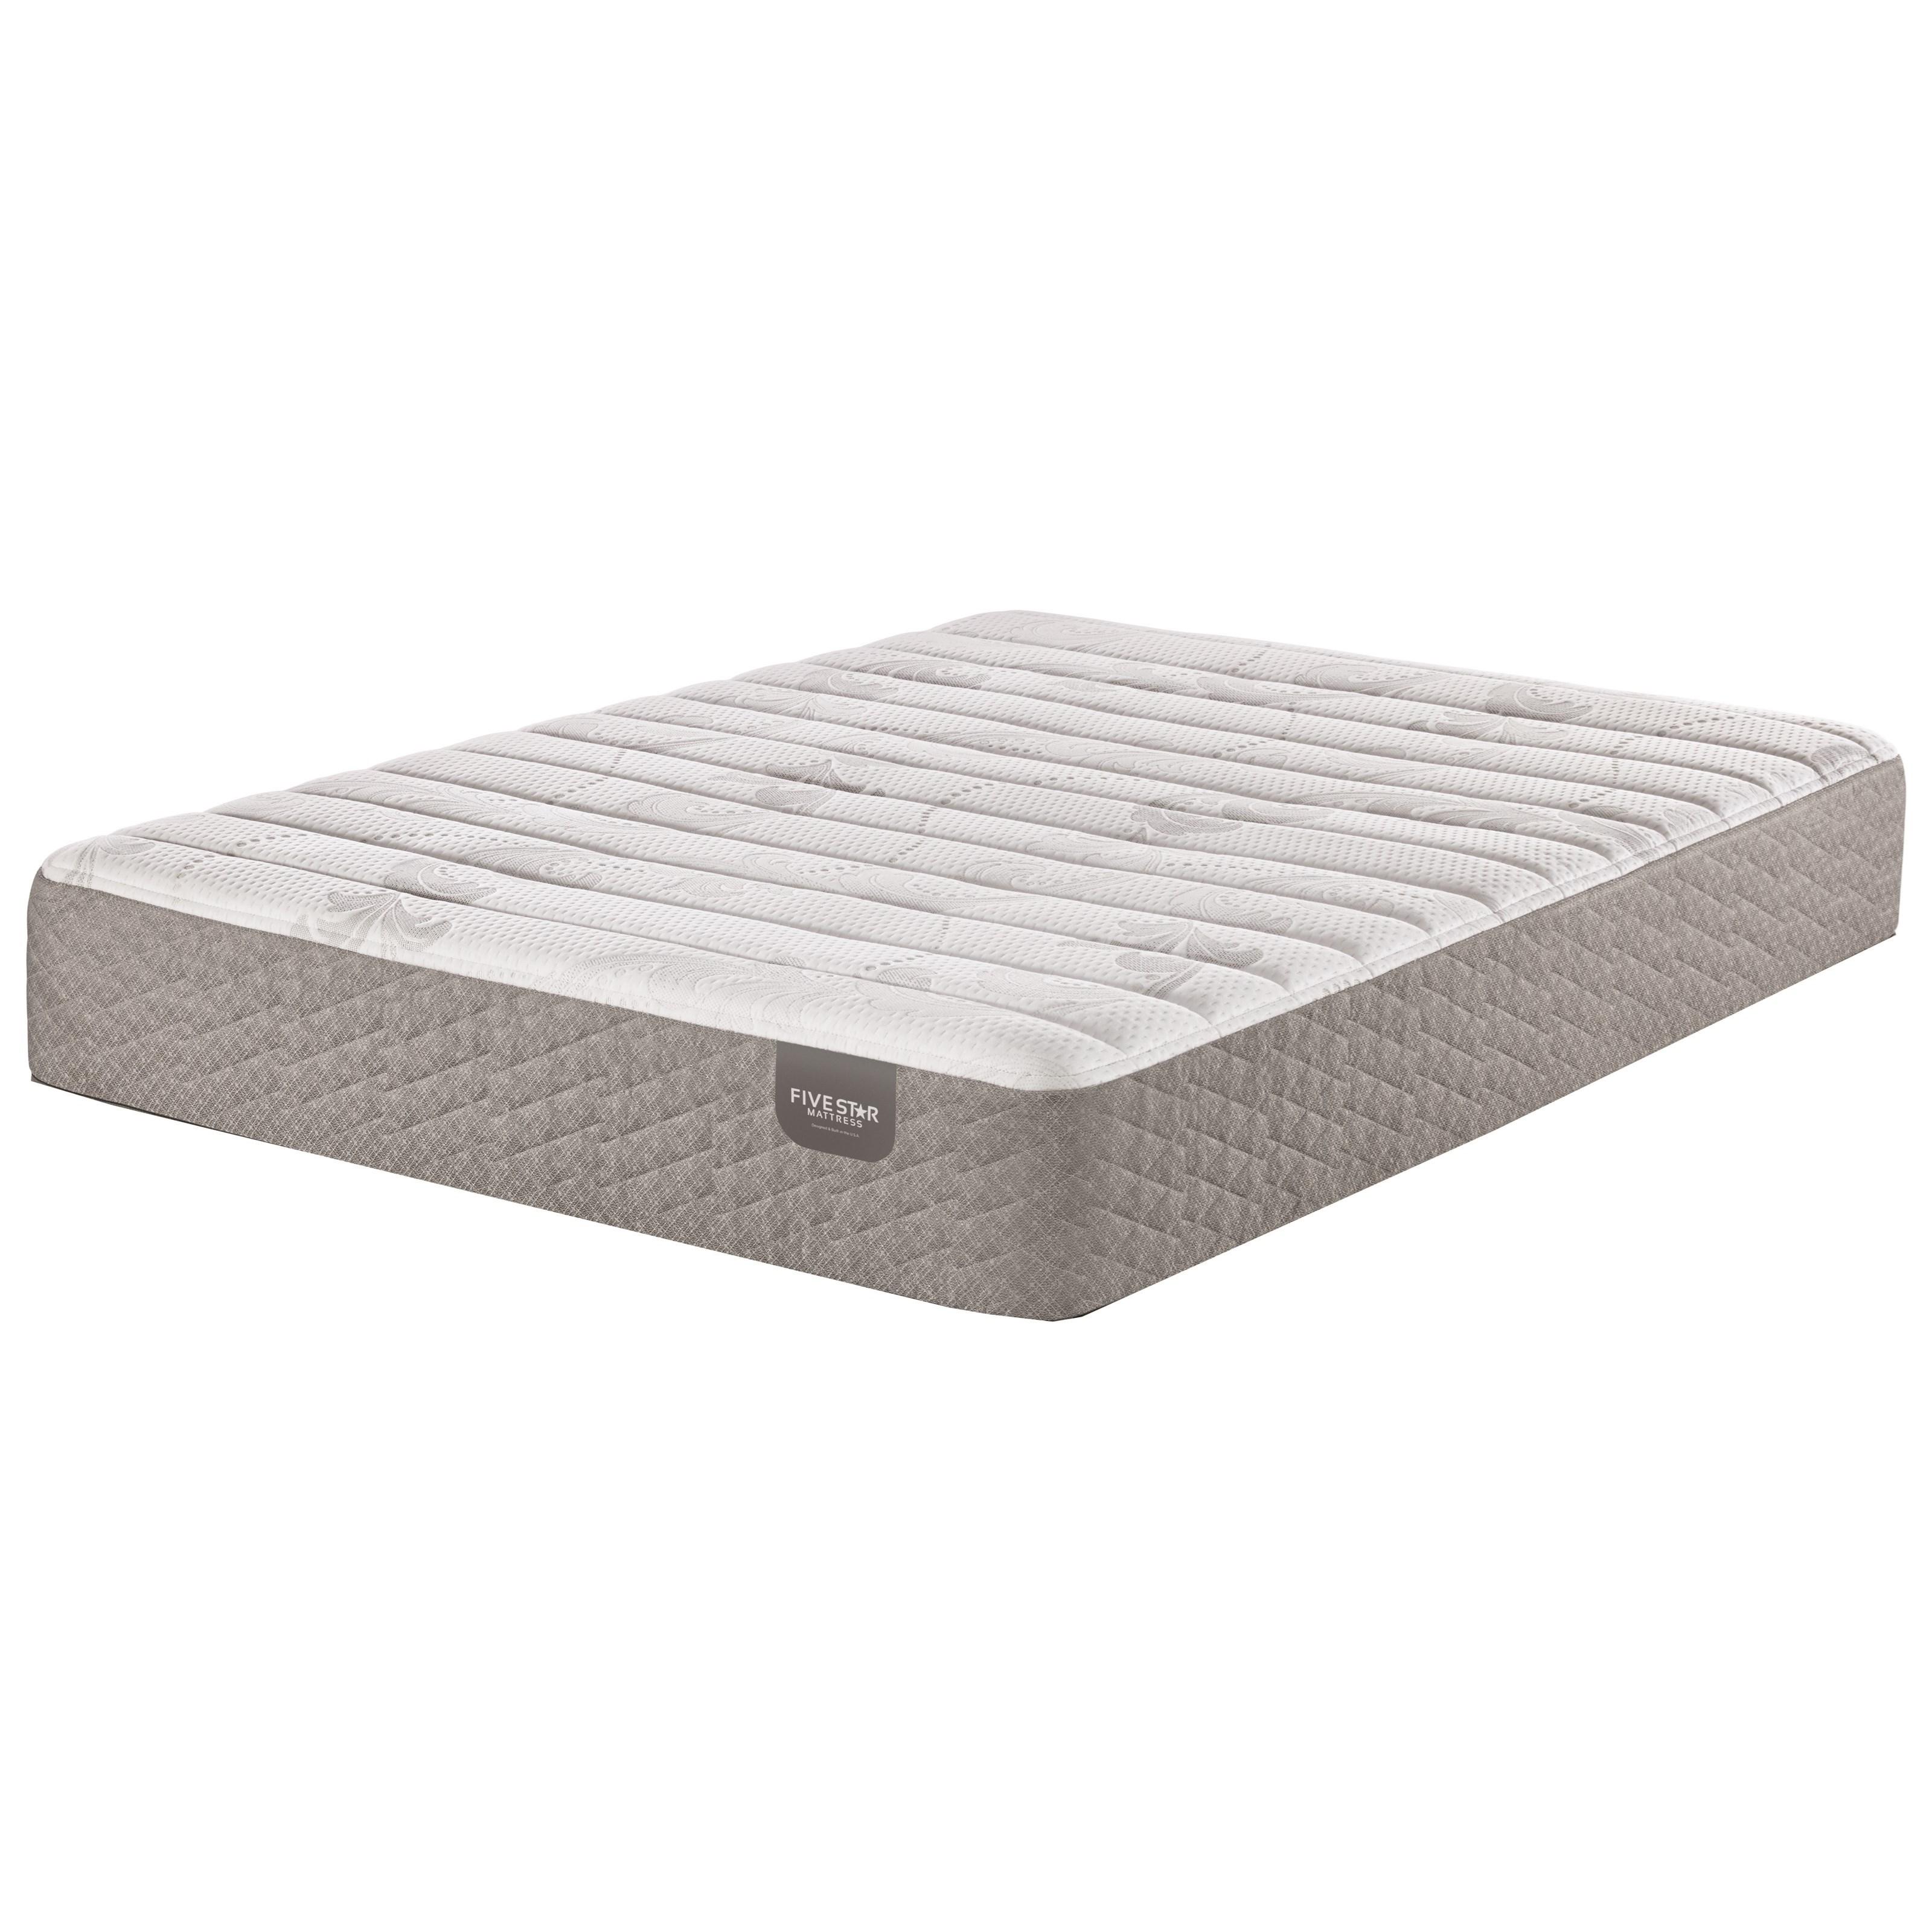 five star mattress palmer foam plush full plush gel memory foam mattress slumberworld mattresses. Black Bedroom Furniture Sets. Home Design Ideas